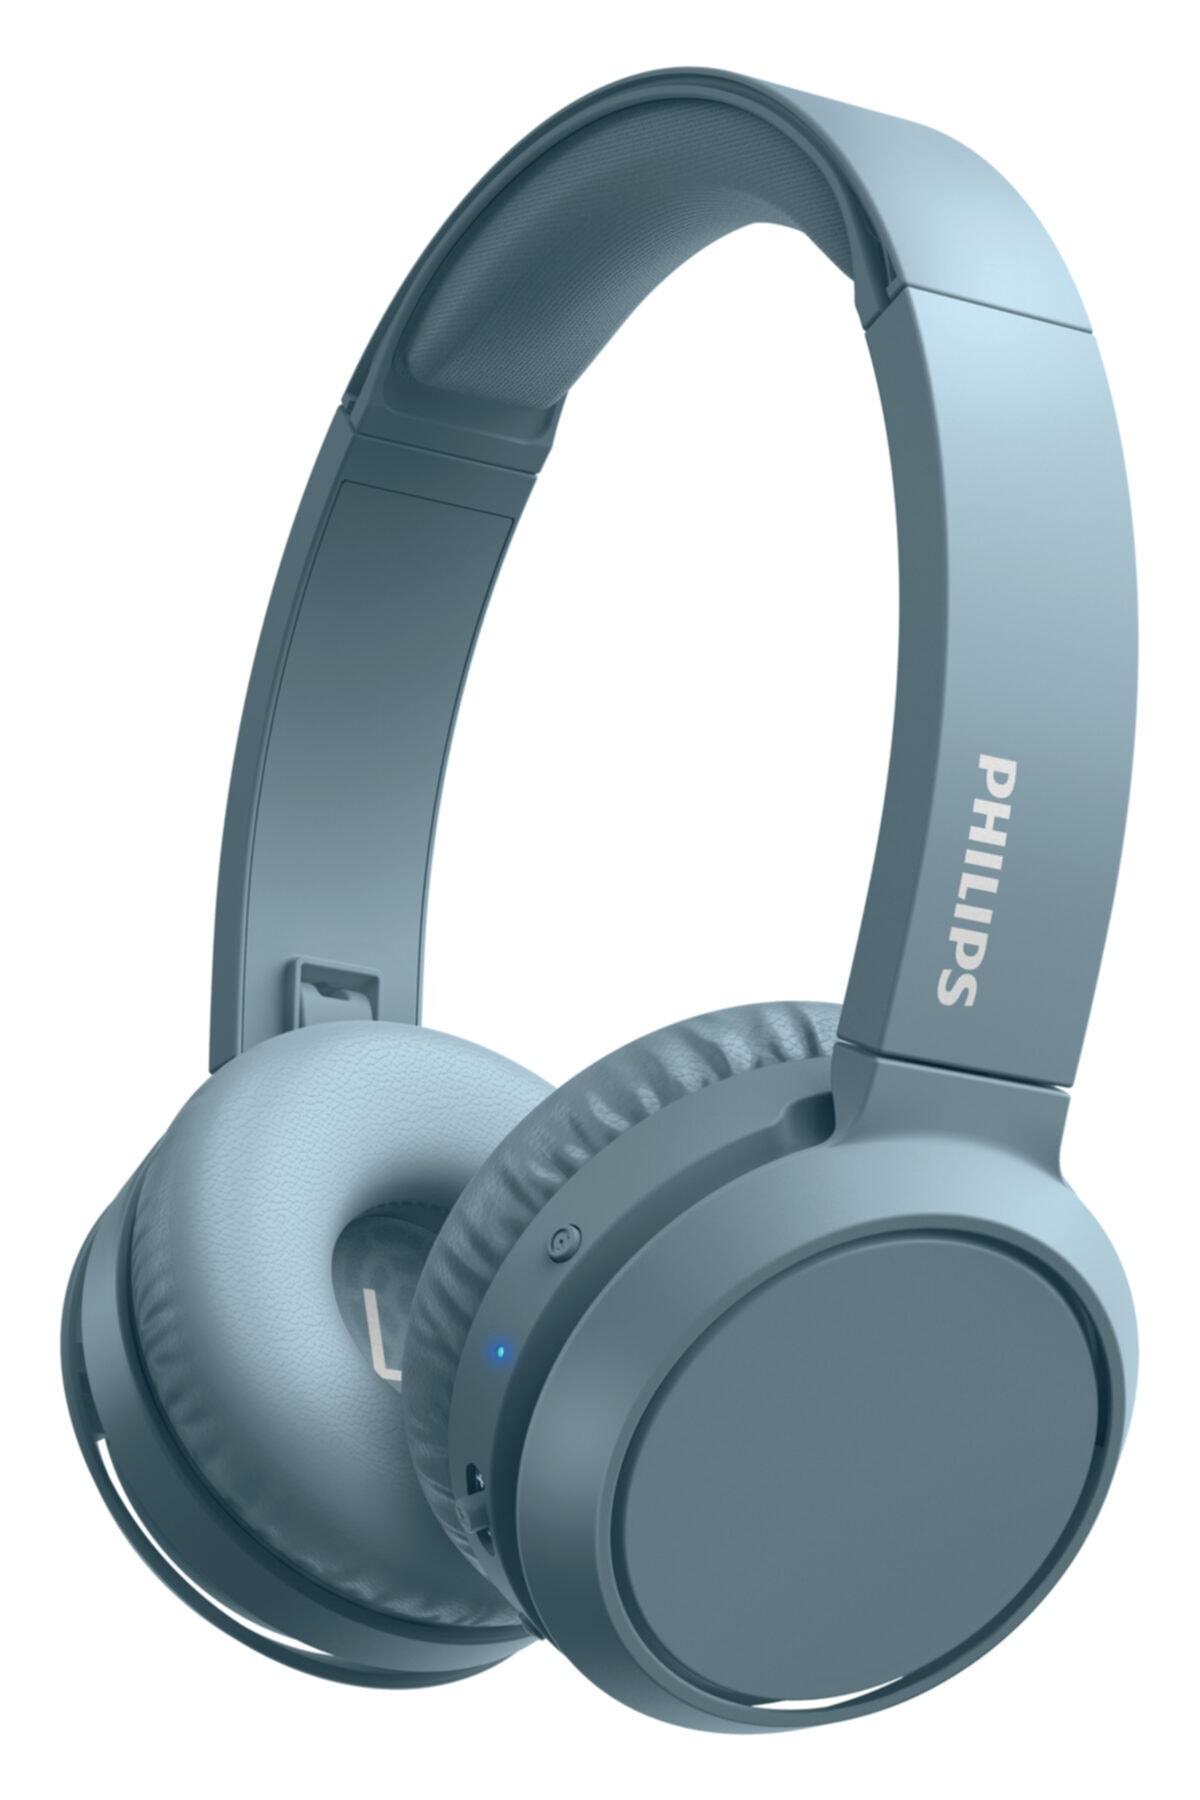 Mavi Bluetooth Kulak Üstü Kulaklık Tah4205